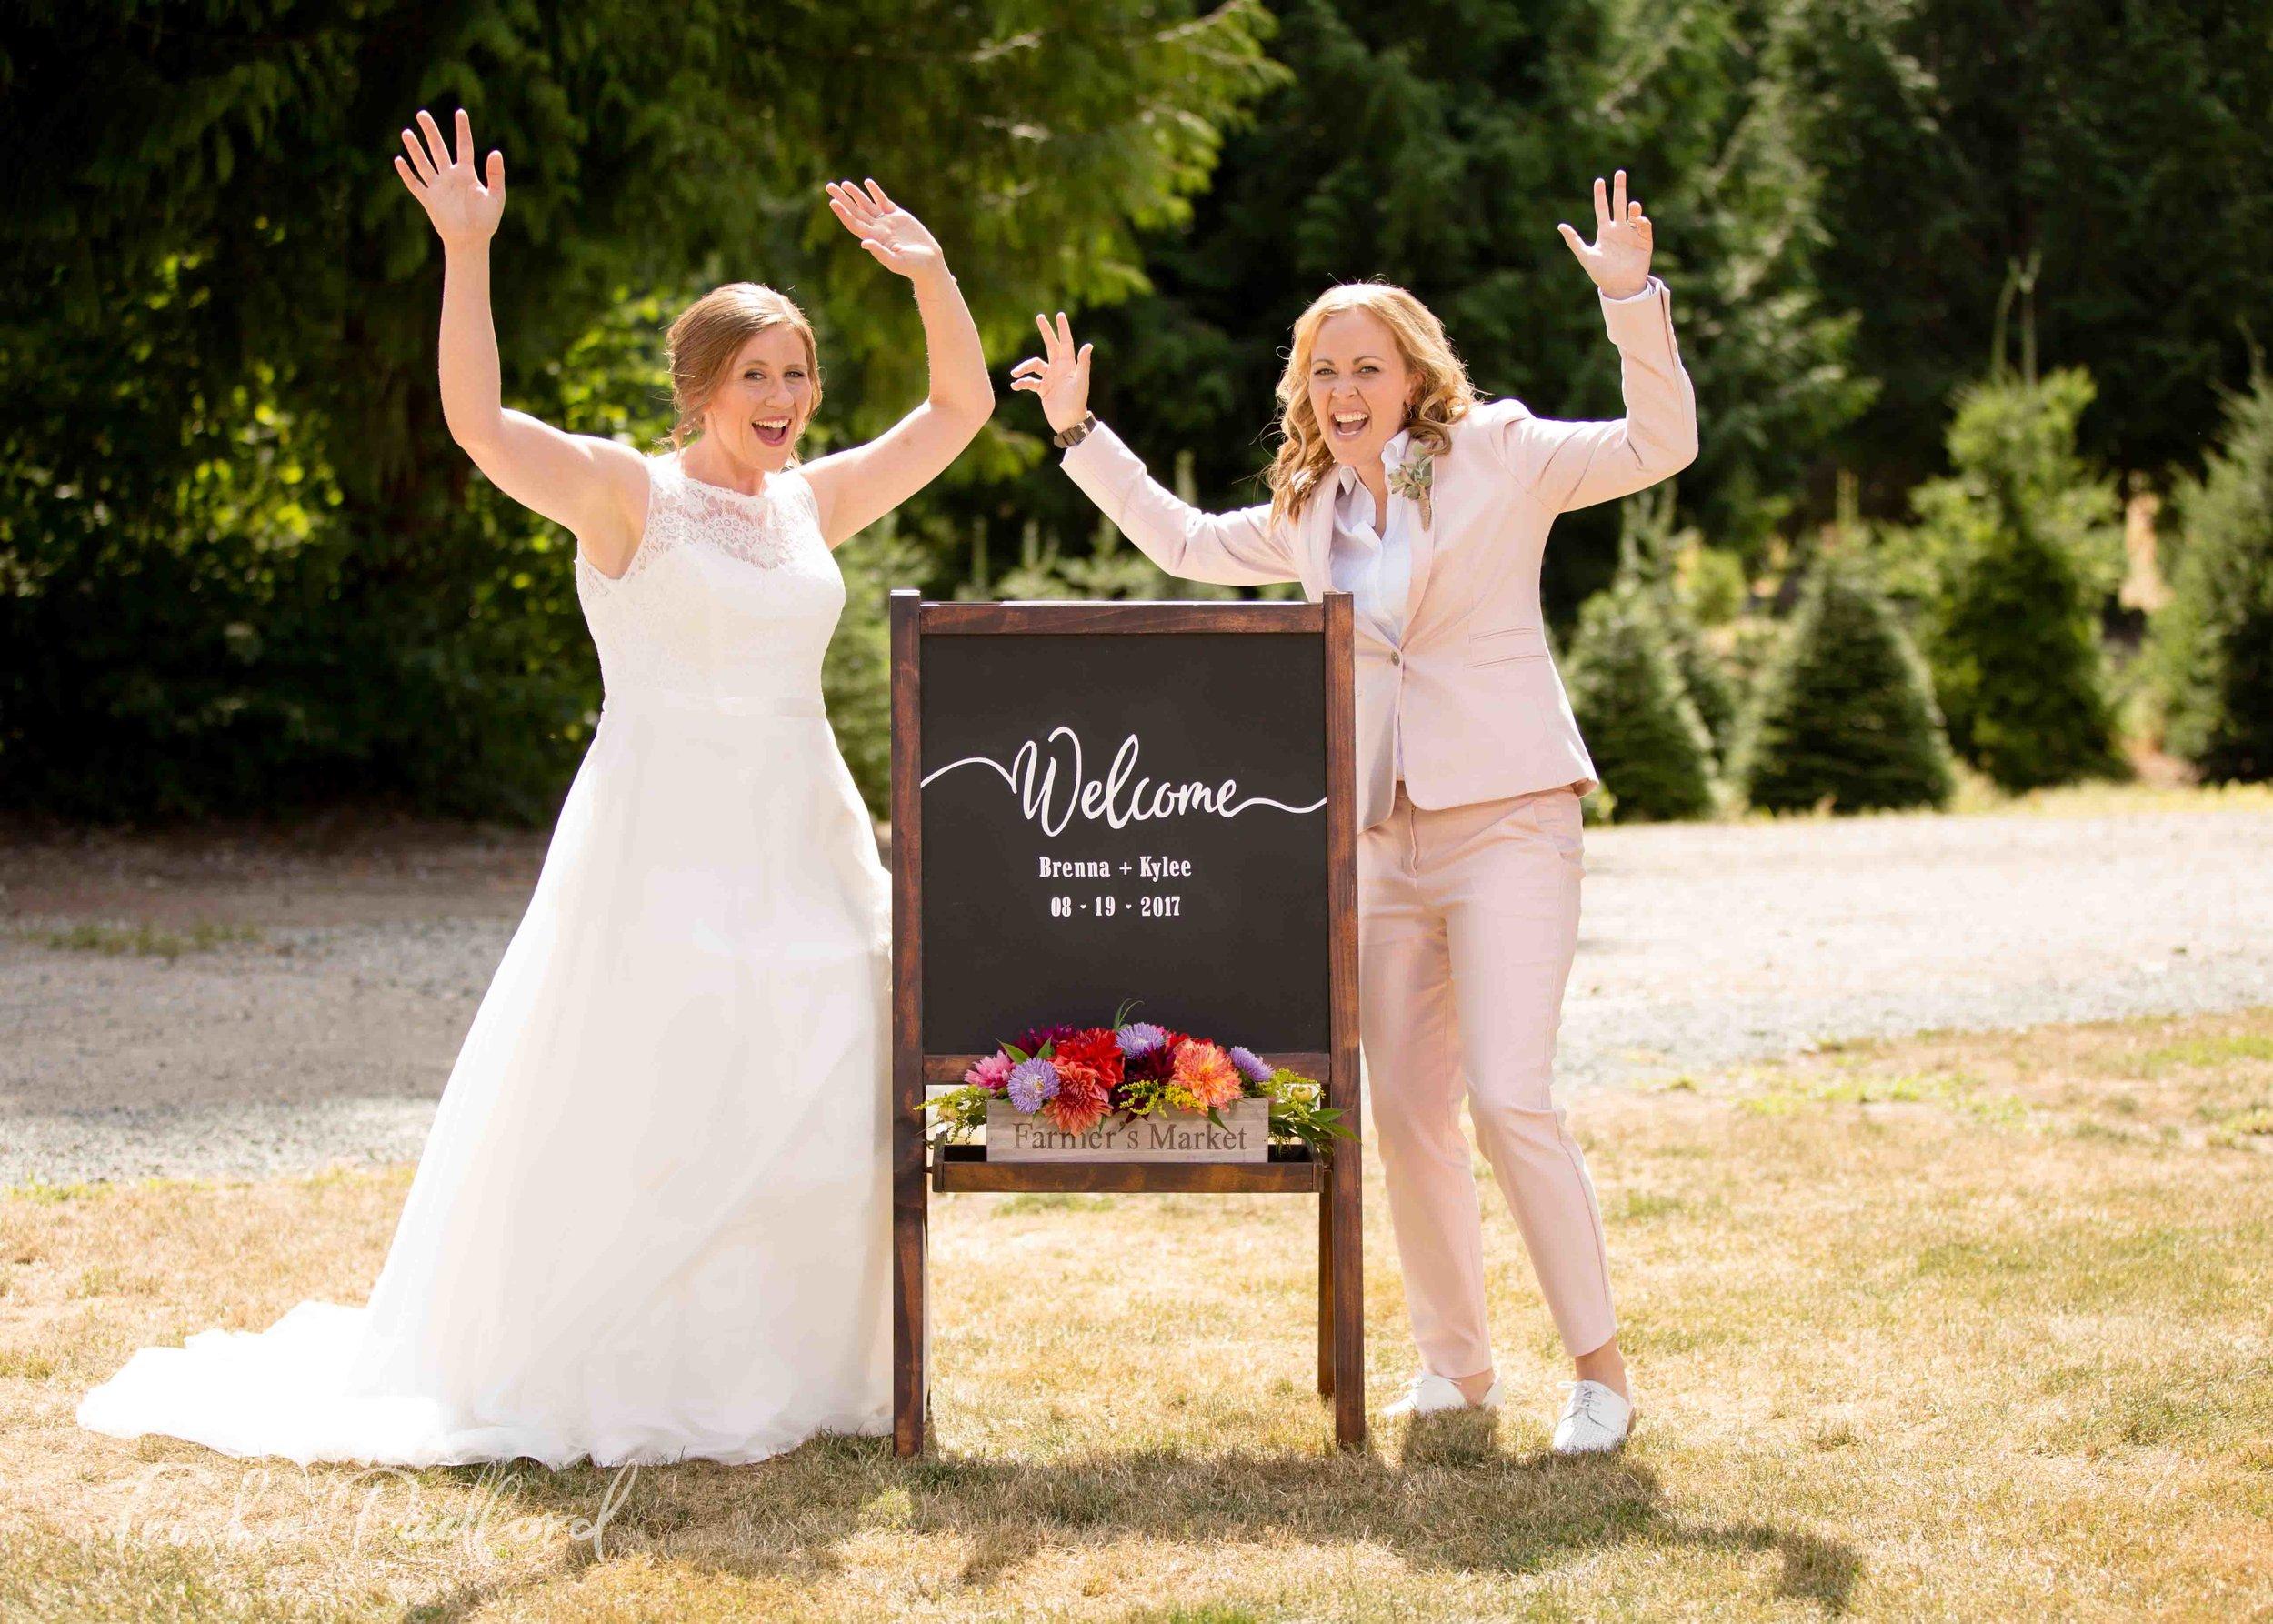 Wedding Photography at Trinity Tree Farm, Issaquah WA - Bridal Portraits